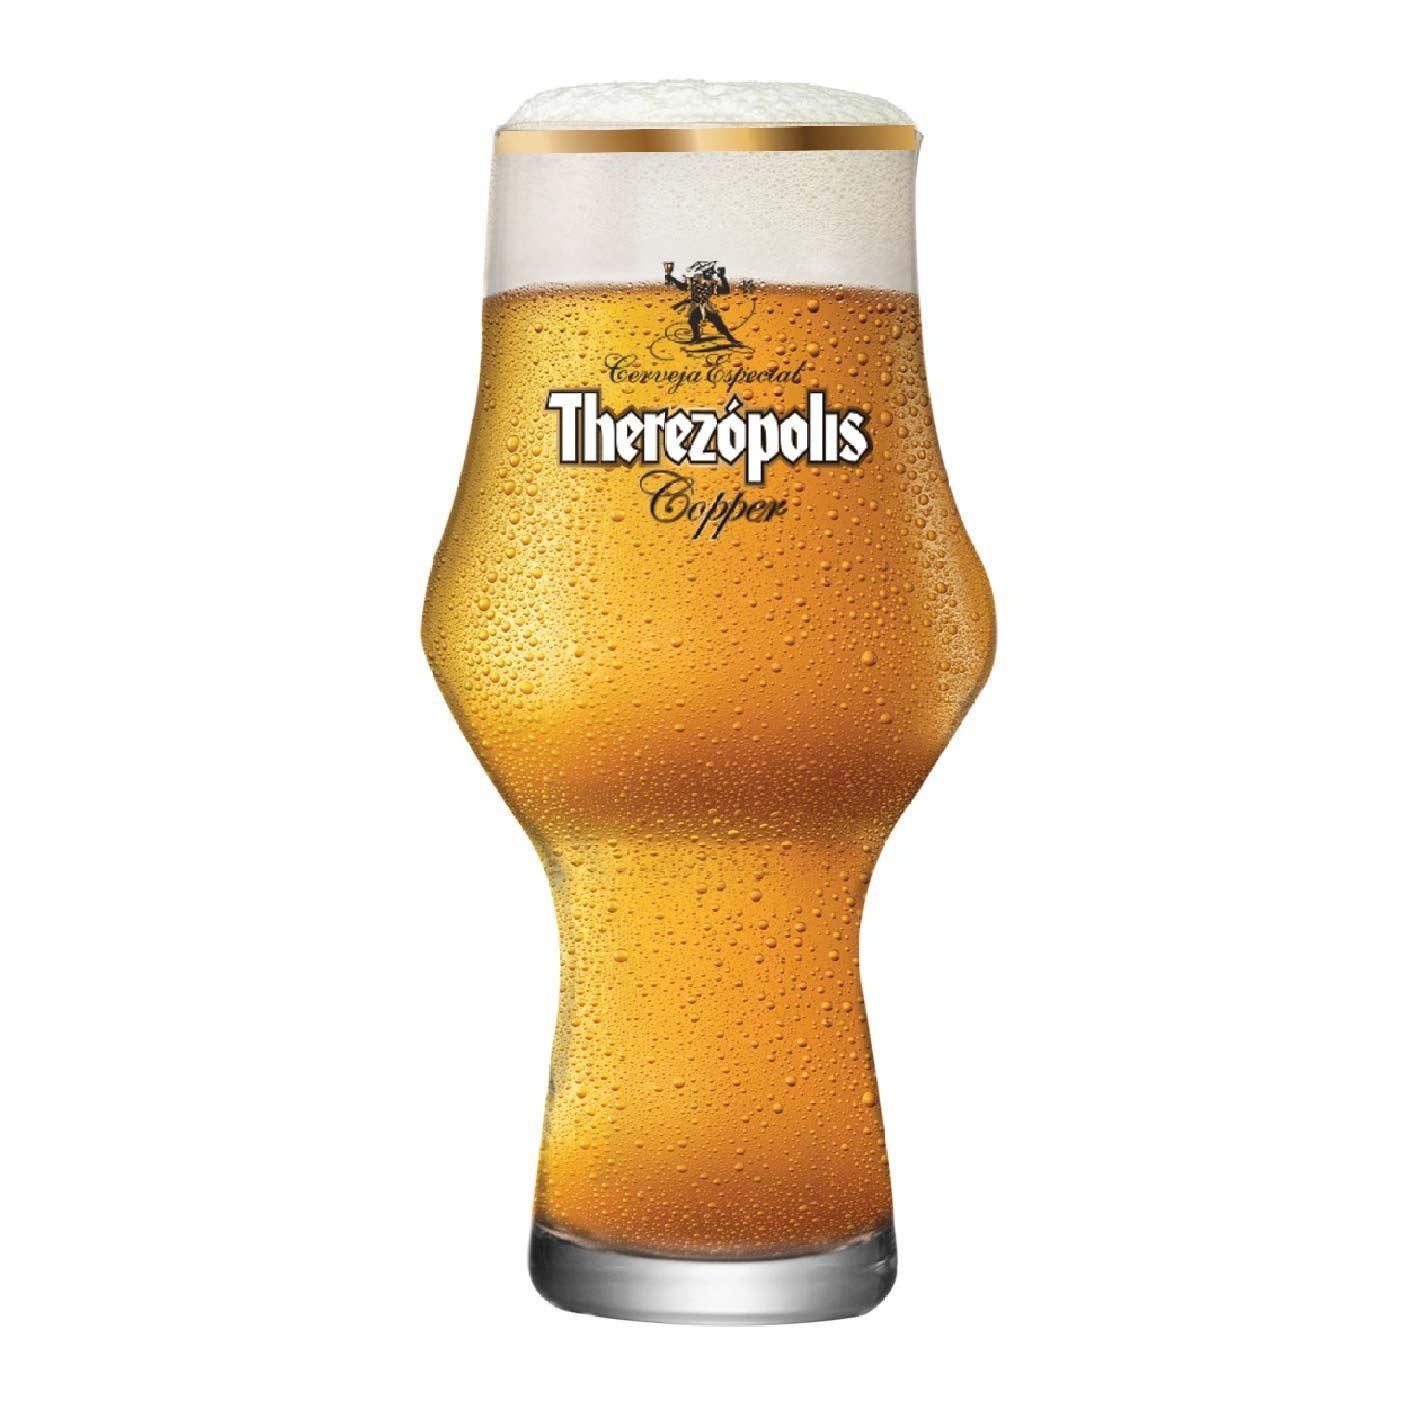 Copo de Cerveja Therezopolis Copper Cristal 495ml